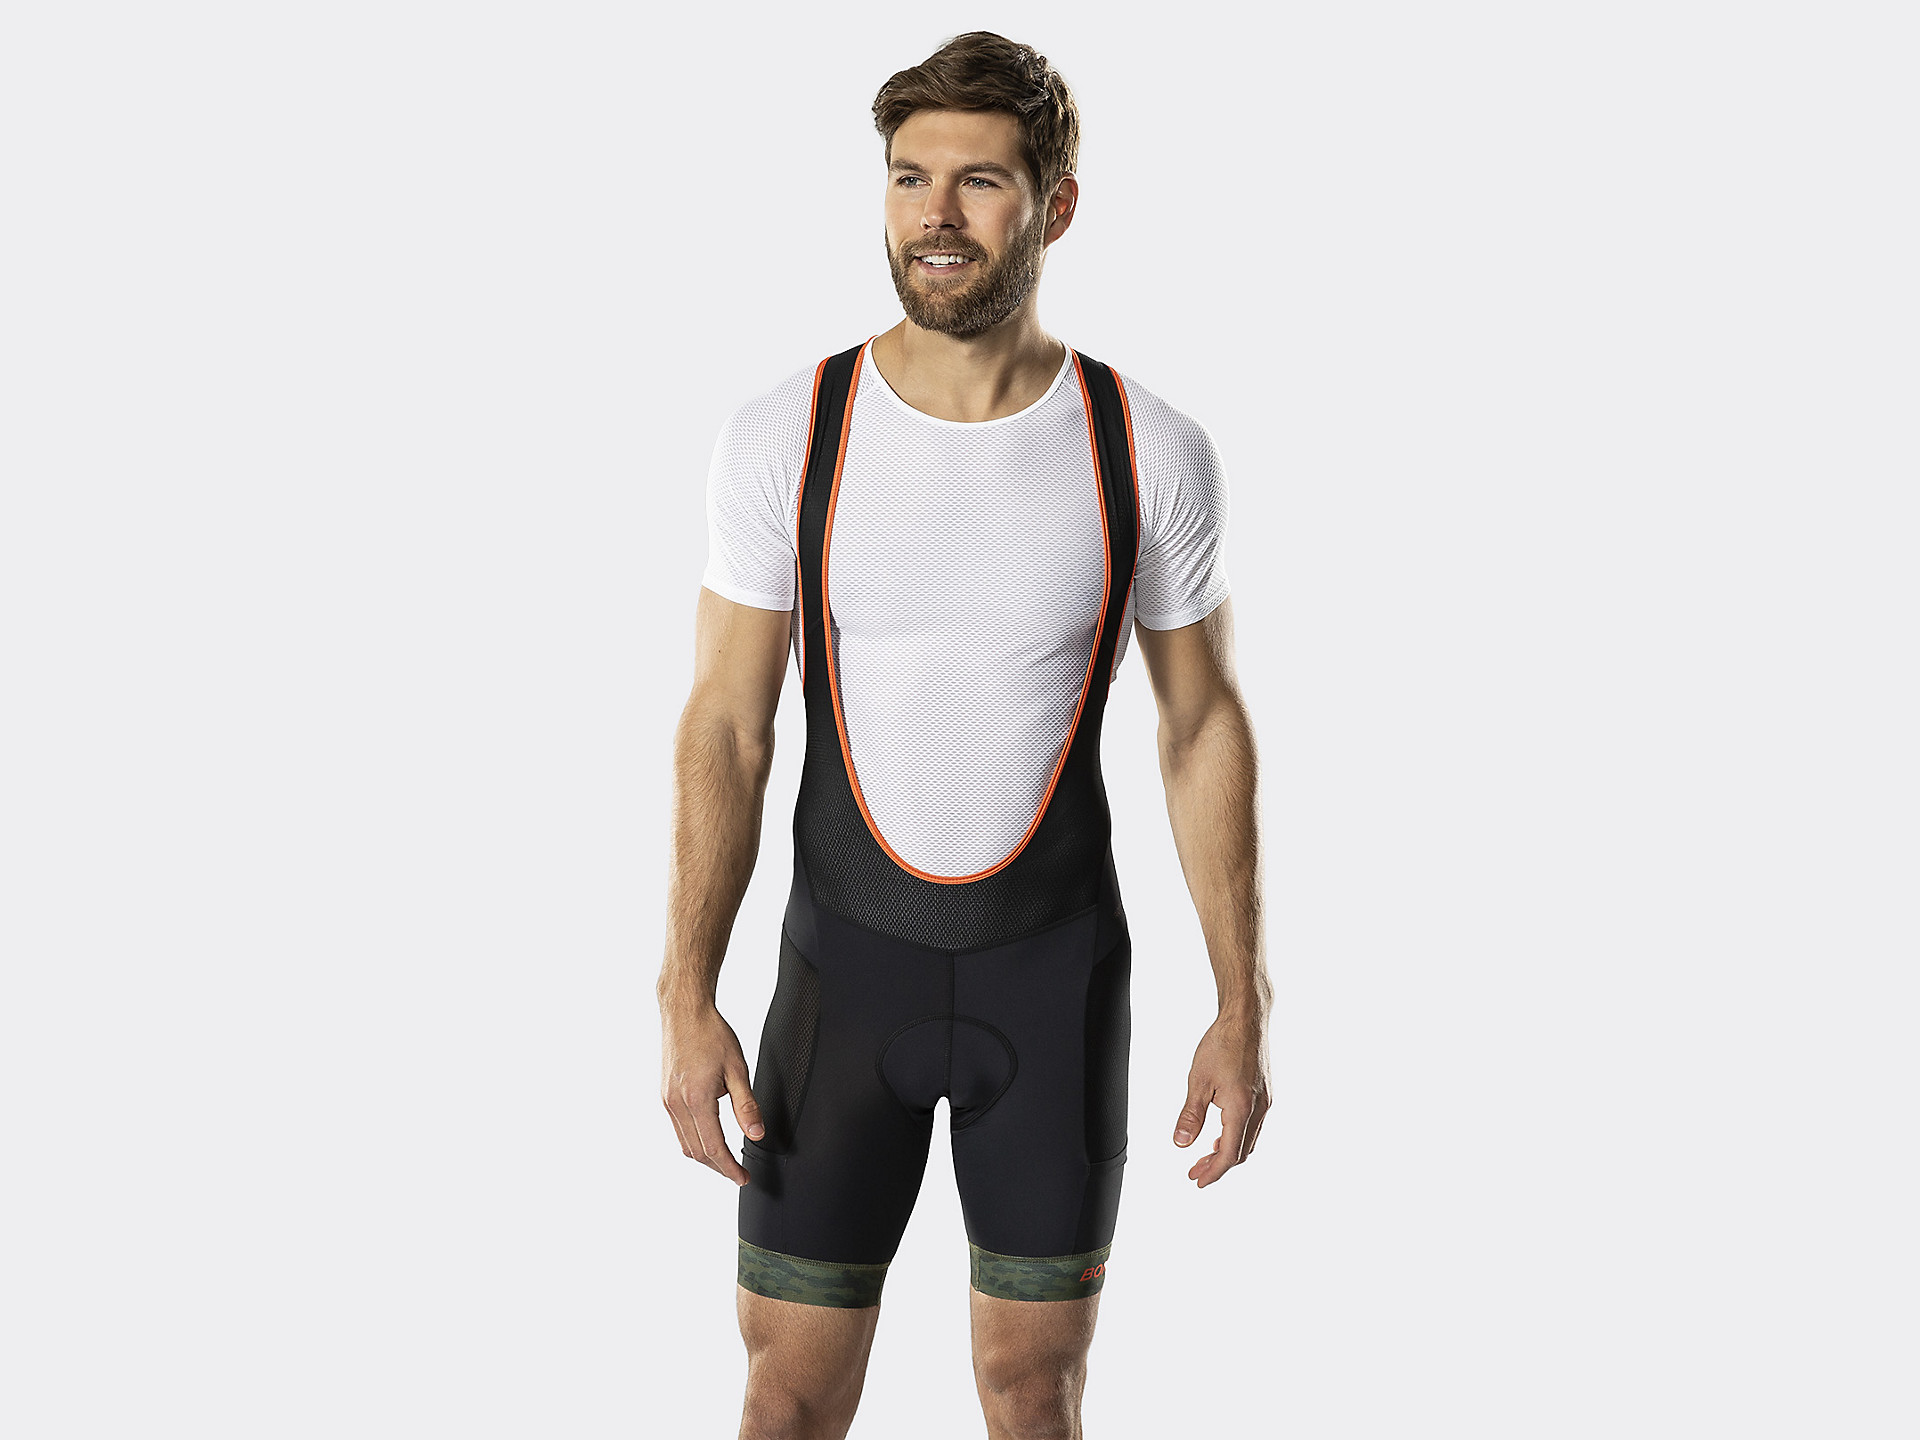 d11252690d Bontrager Troslo inForm Cycling Liner Bib Short | Trek Bikes